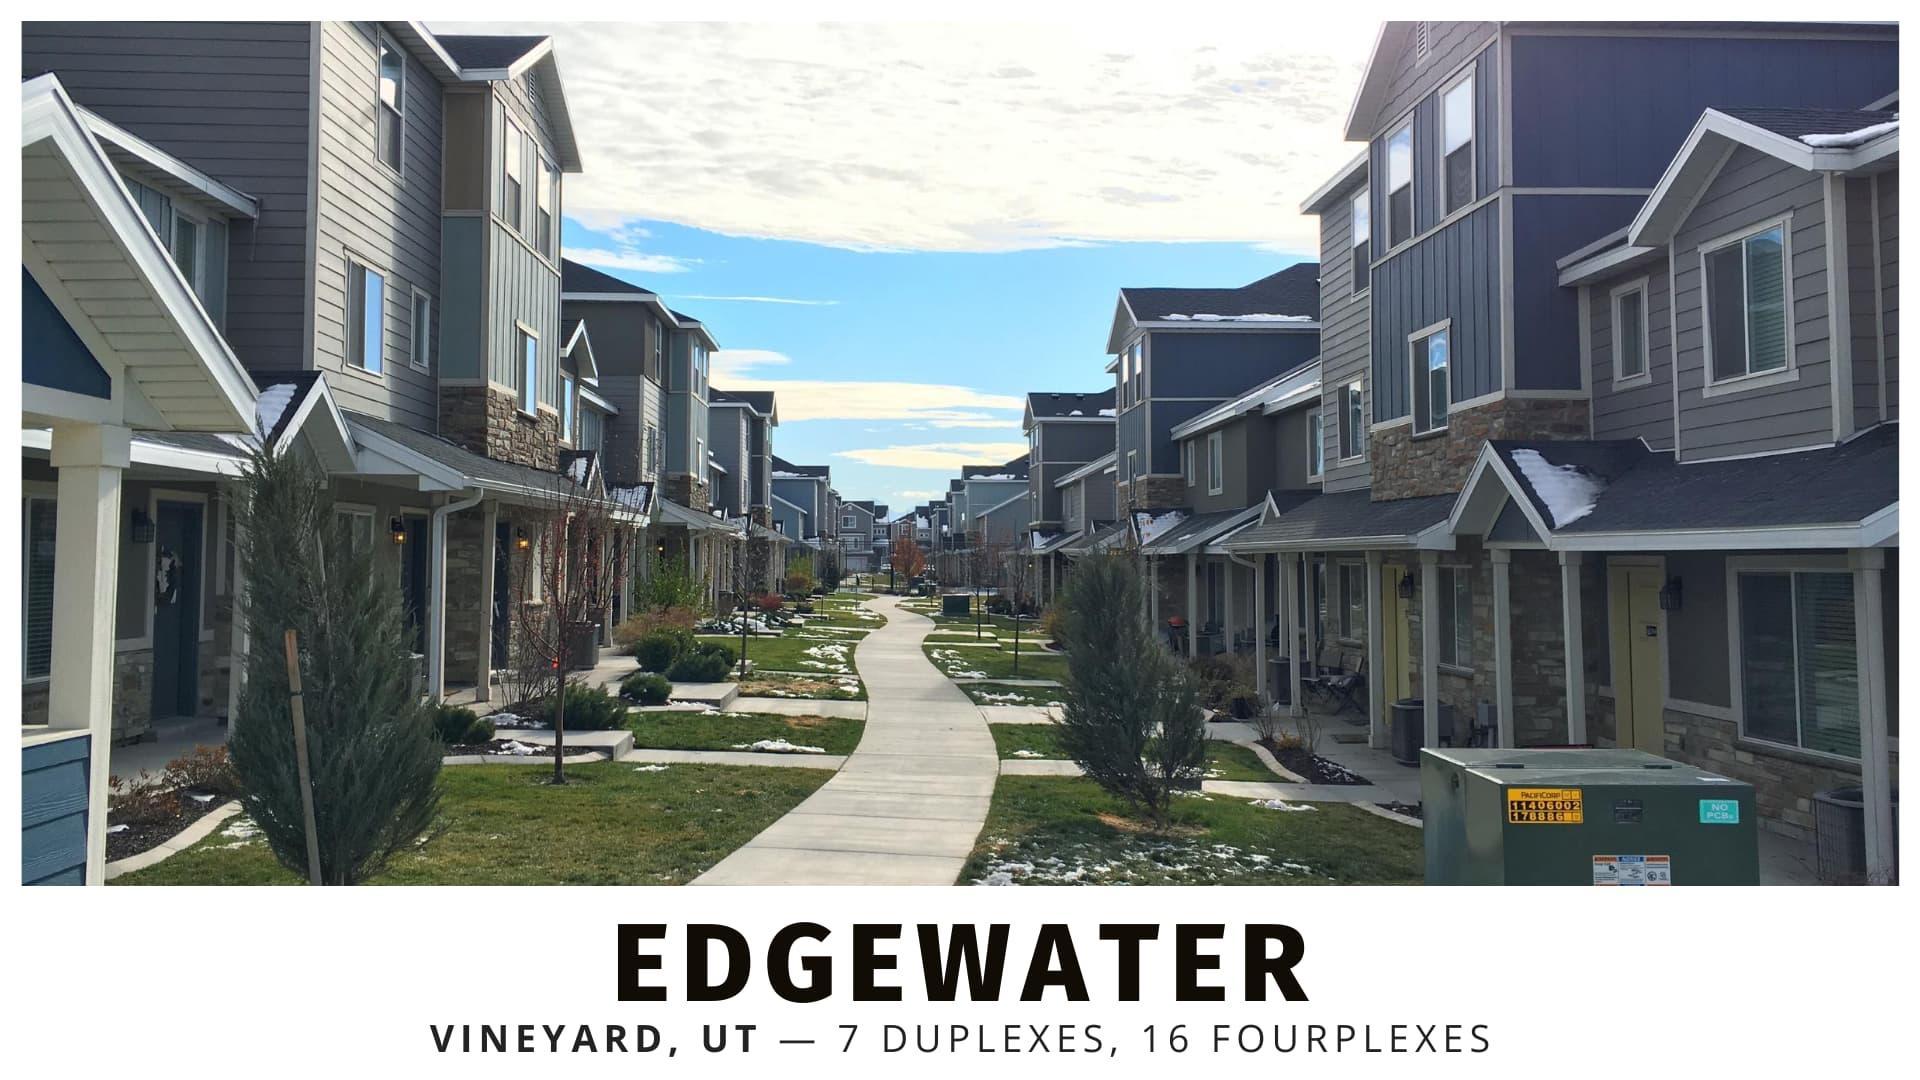 Edgewater fourplexes and duplexes in Vineyard, Utah